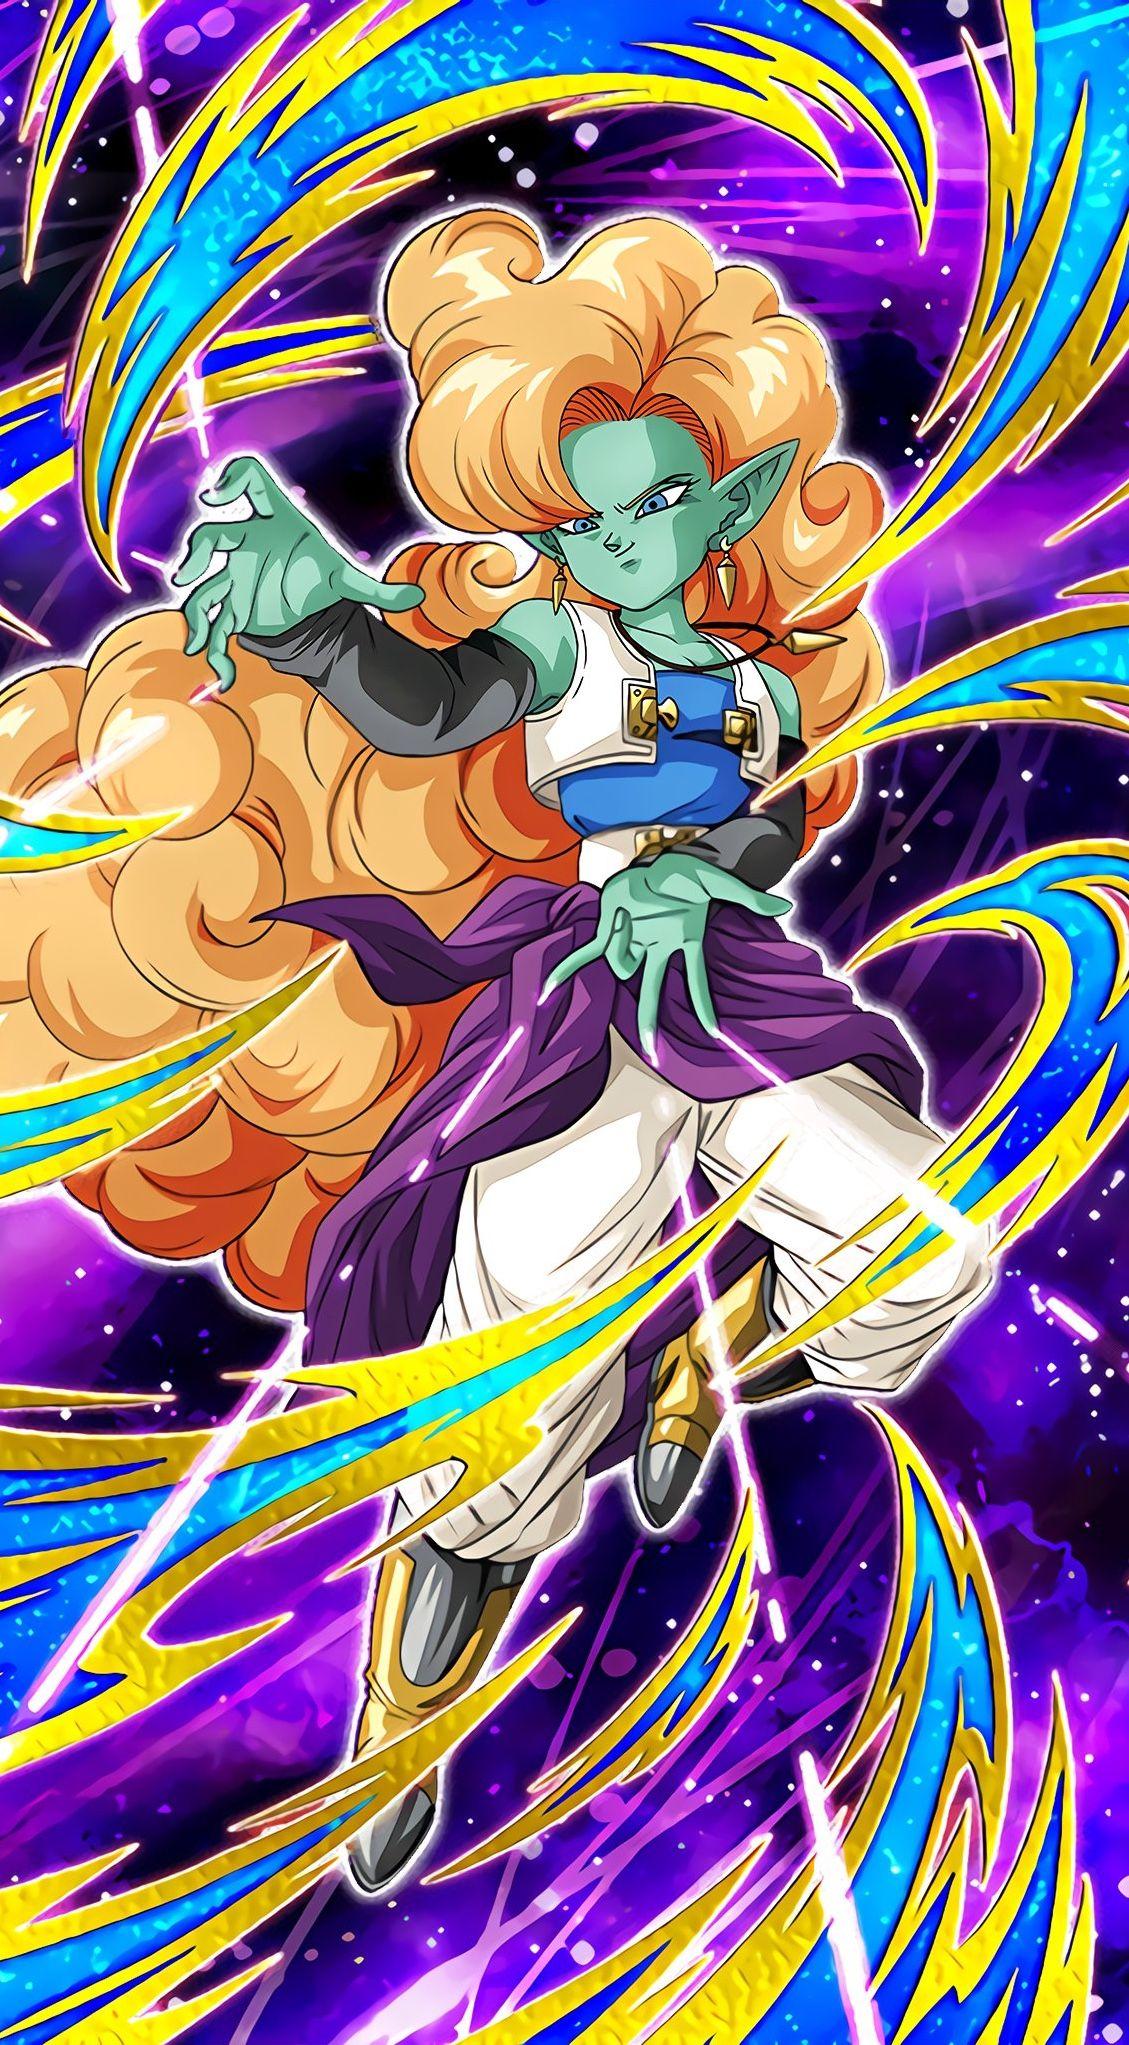 Zangya Ur Anime Ball Drawing Dragon Ball